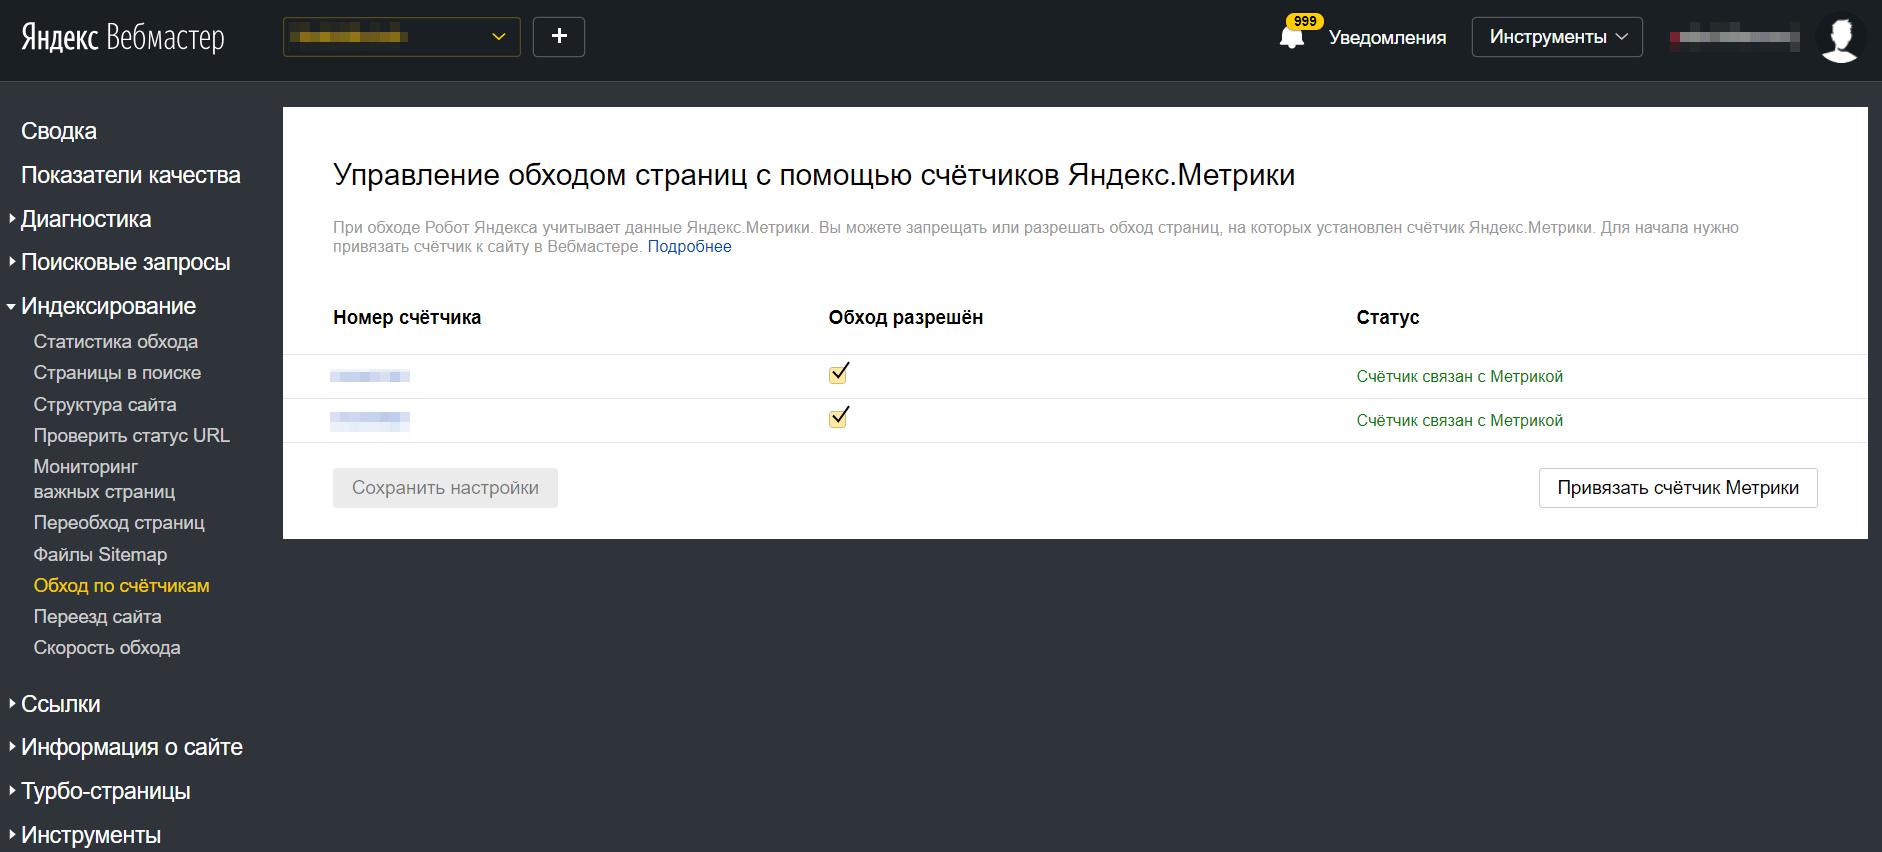 Метрики в Яндекс.Вебмастере